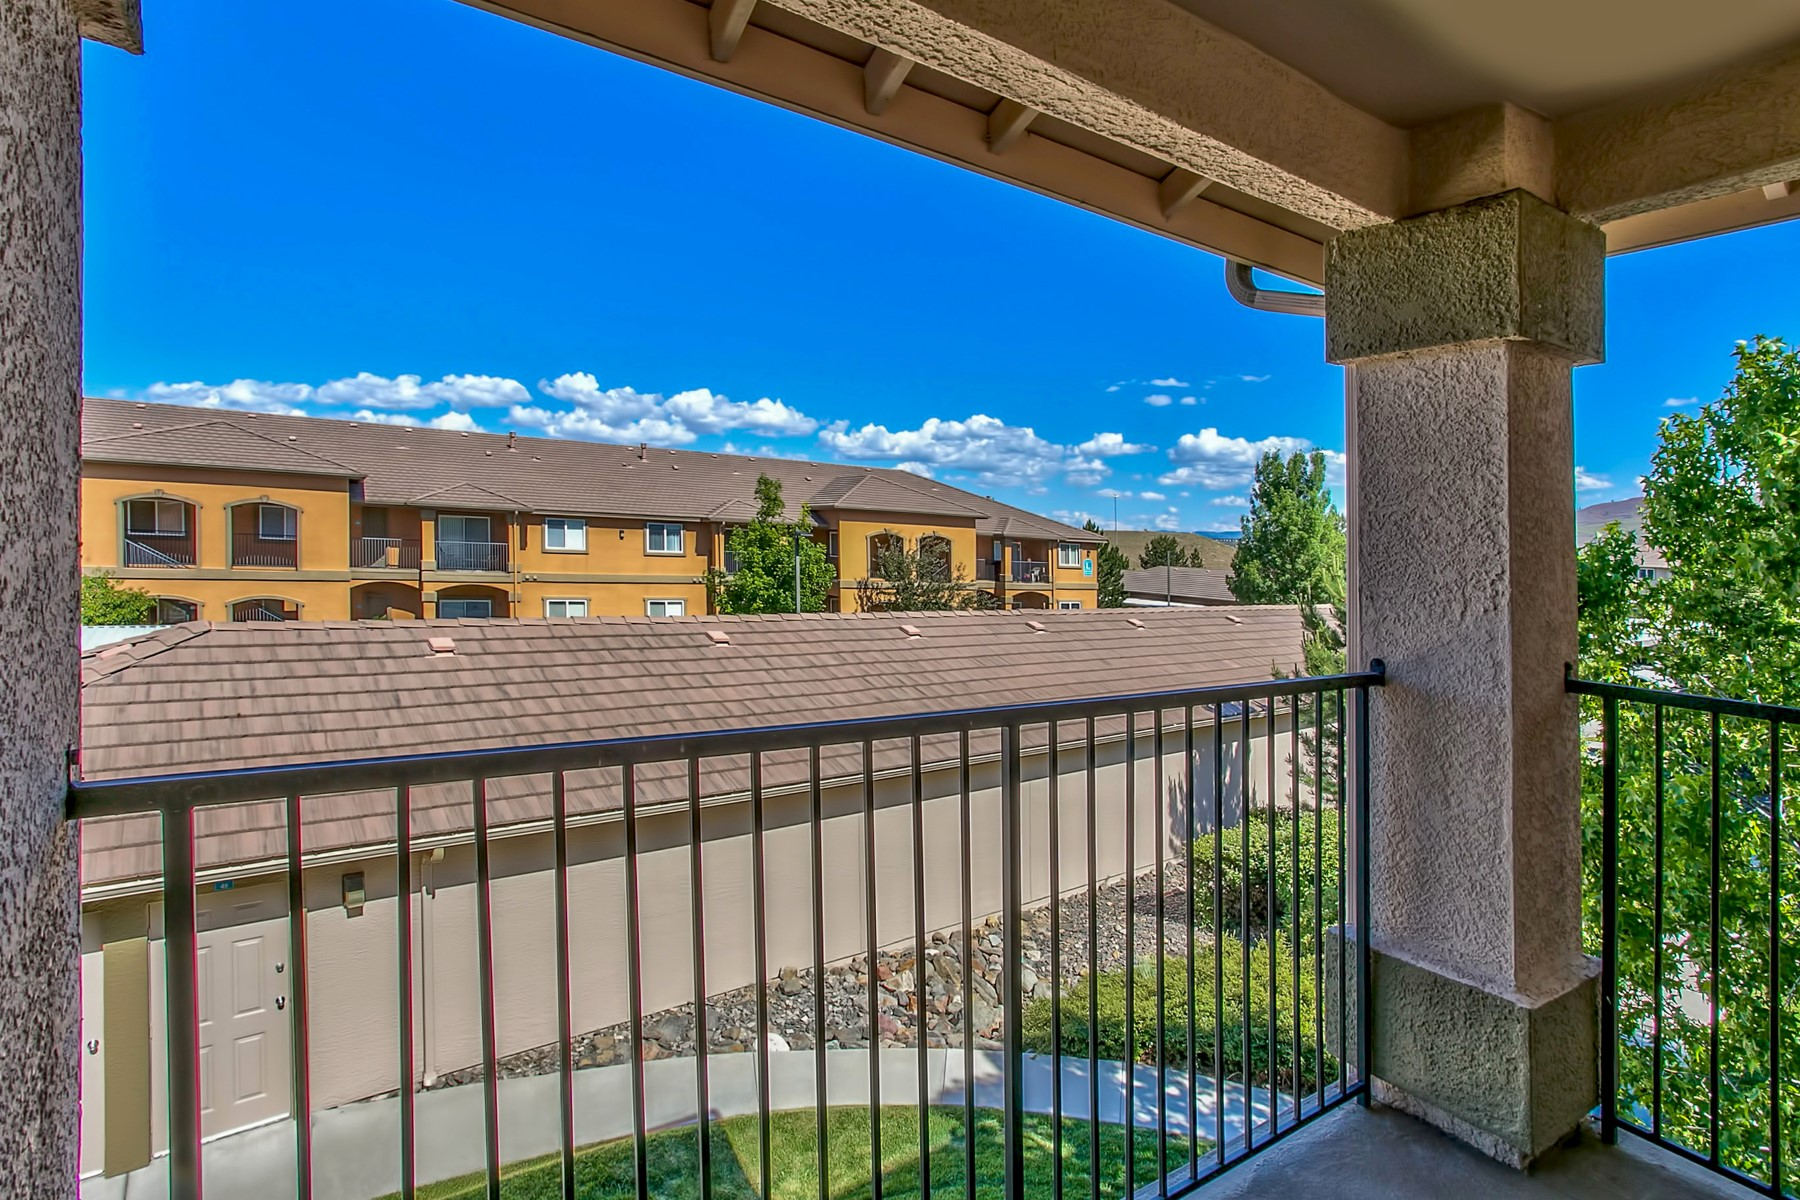 Condominium for Sale at 6850 Sharlands #2058 K 6850 Sharlands Avenue #2058 K Reno, Nevada 89523 United States